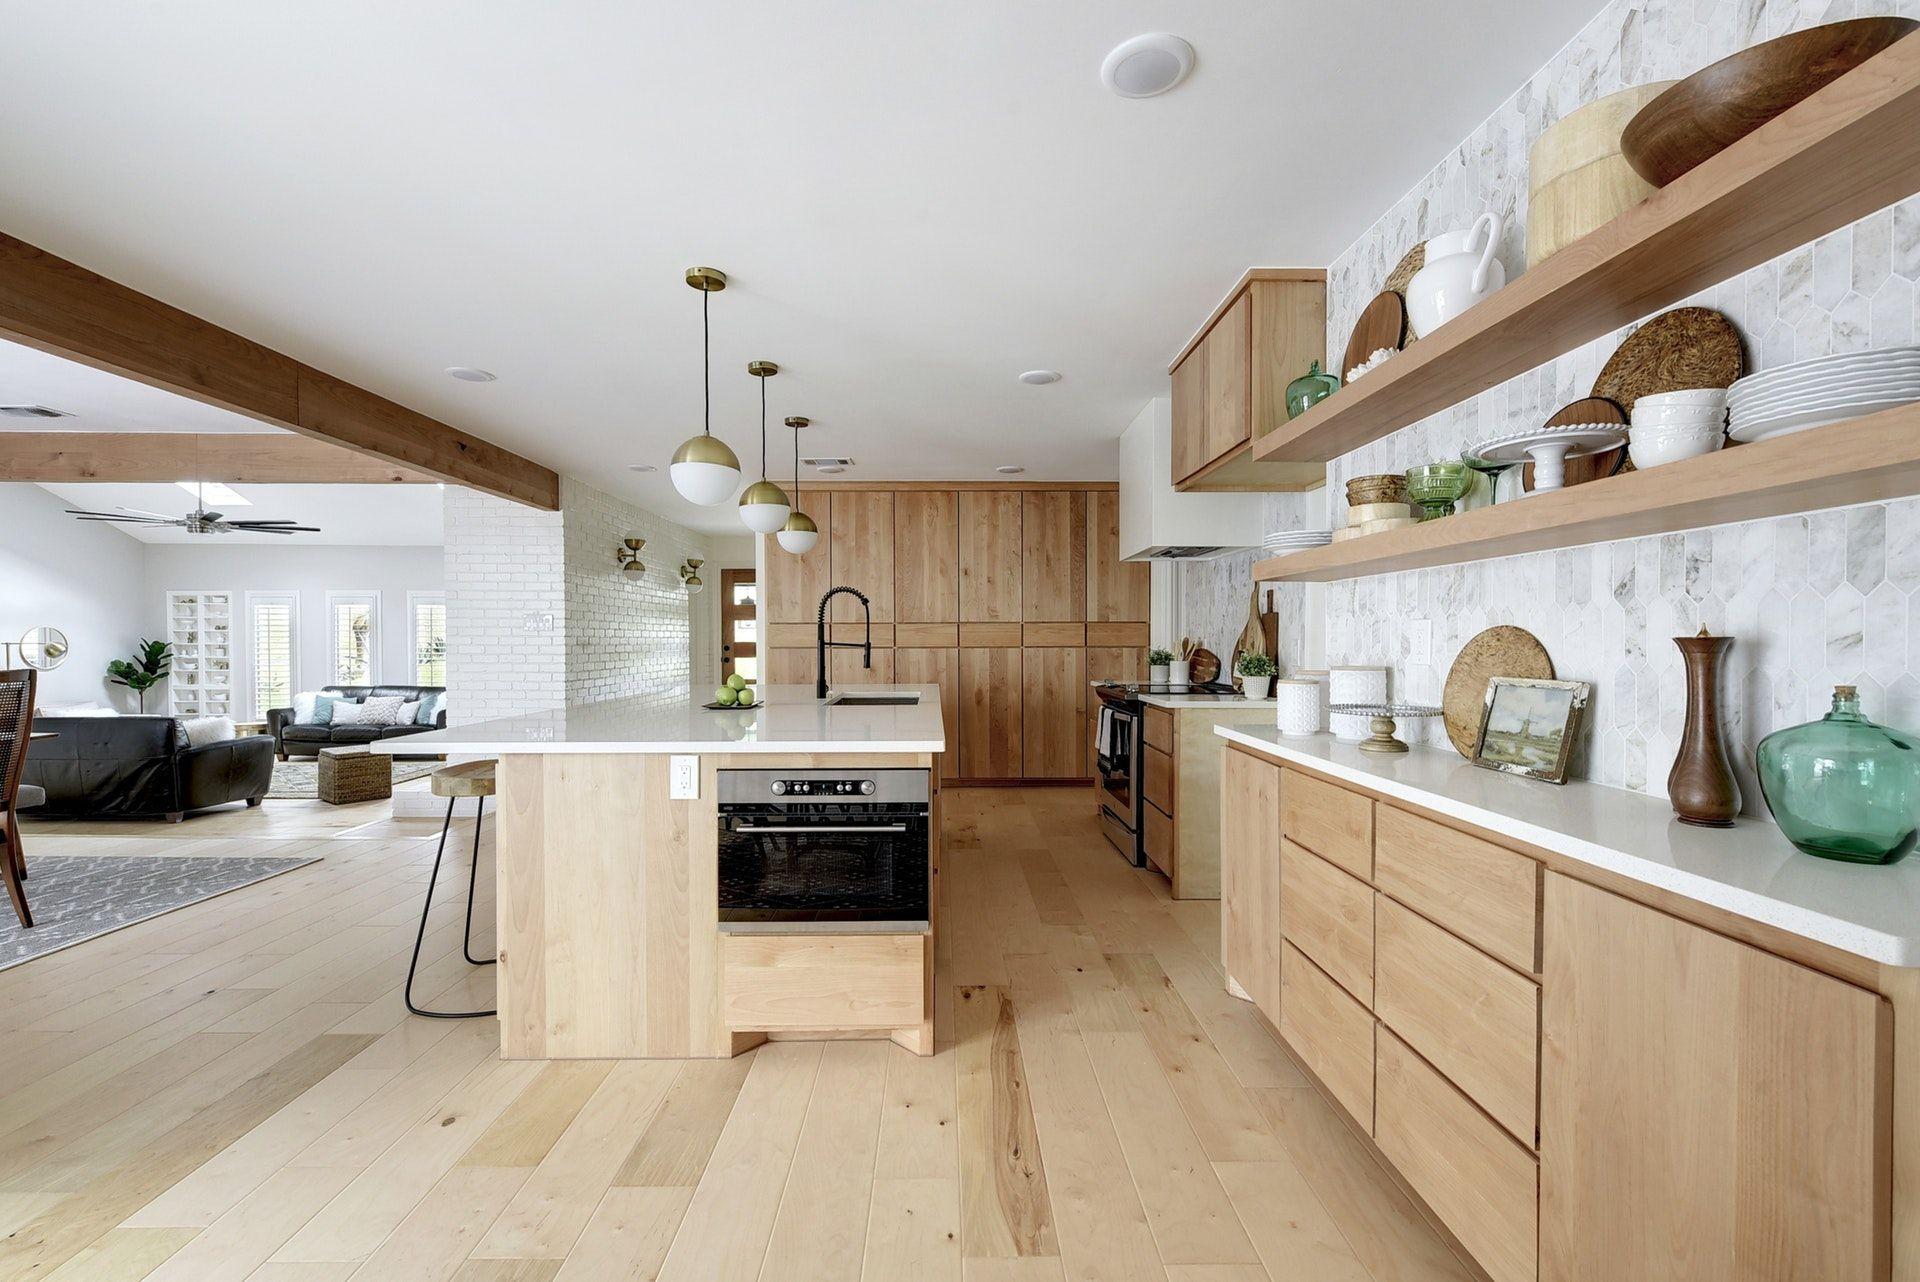 Open Kitchen With Flat Front Natural Alder Wood Cabinets Light Wood Floors Globe Pen Natural Wood Kitchen Cabinets Wood Kitchen Cabinets Natural Wood Kitchen